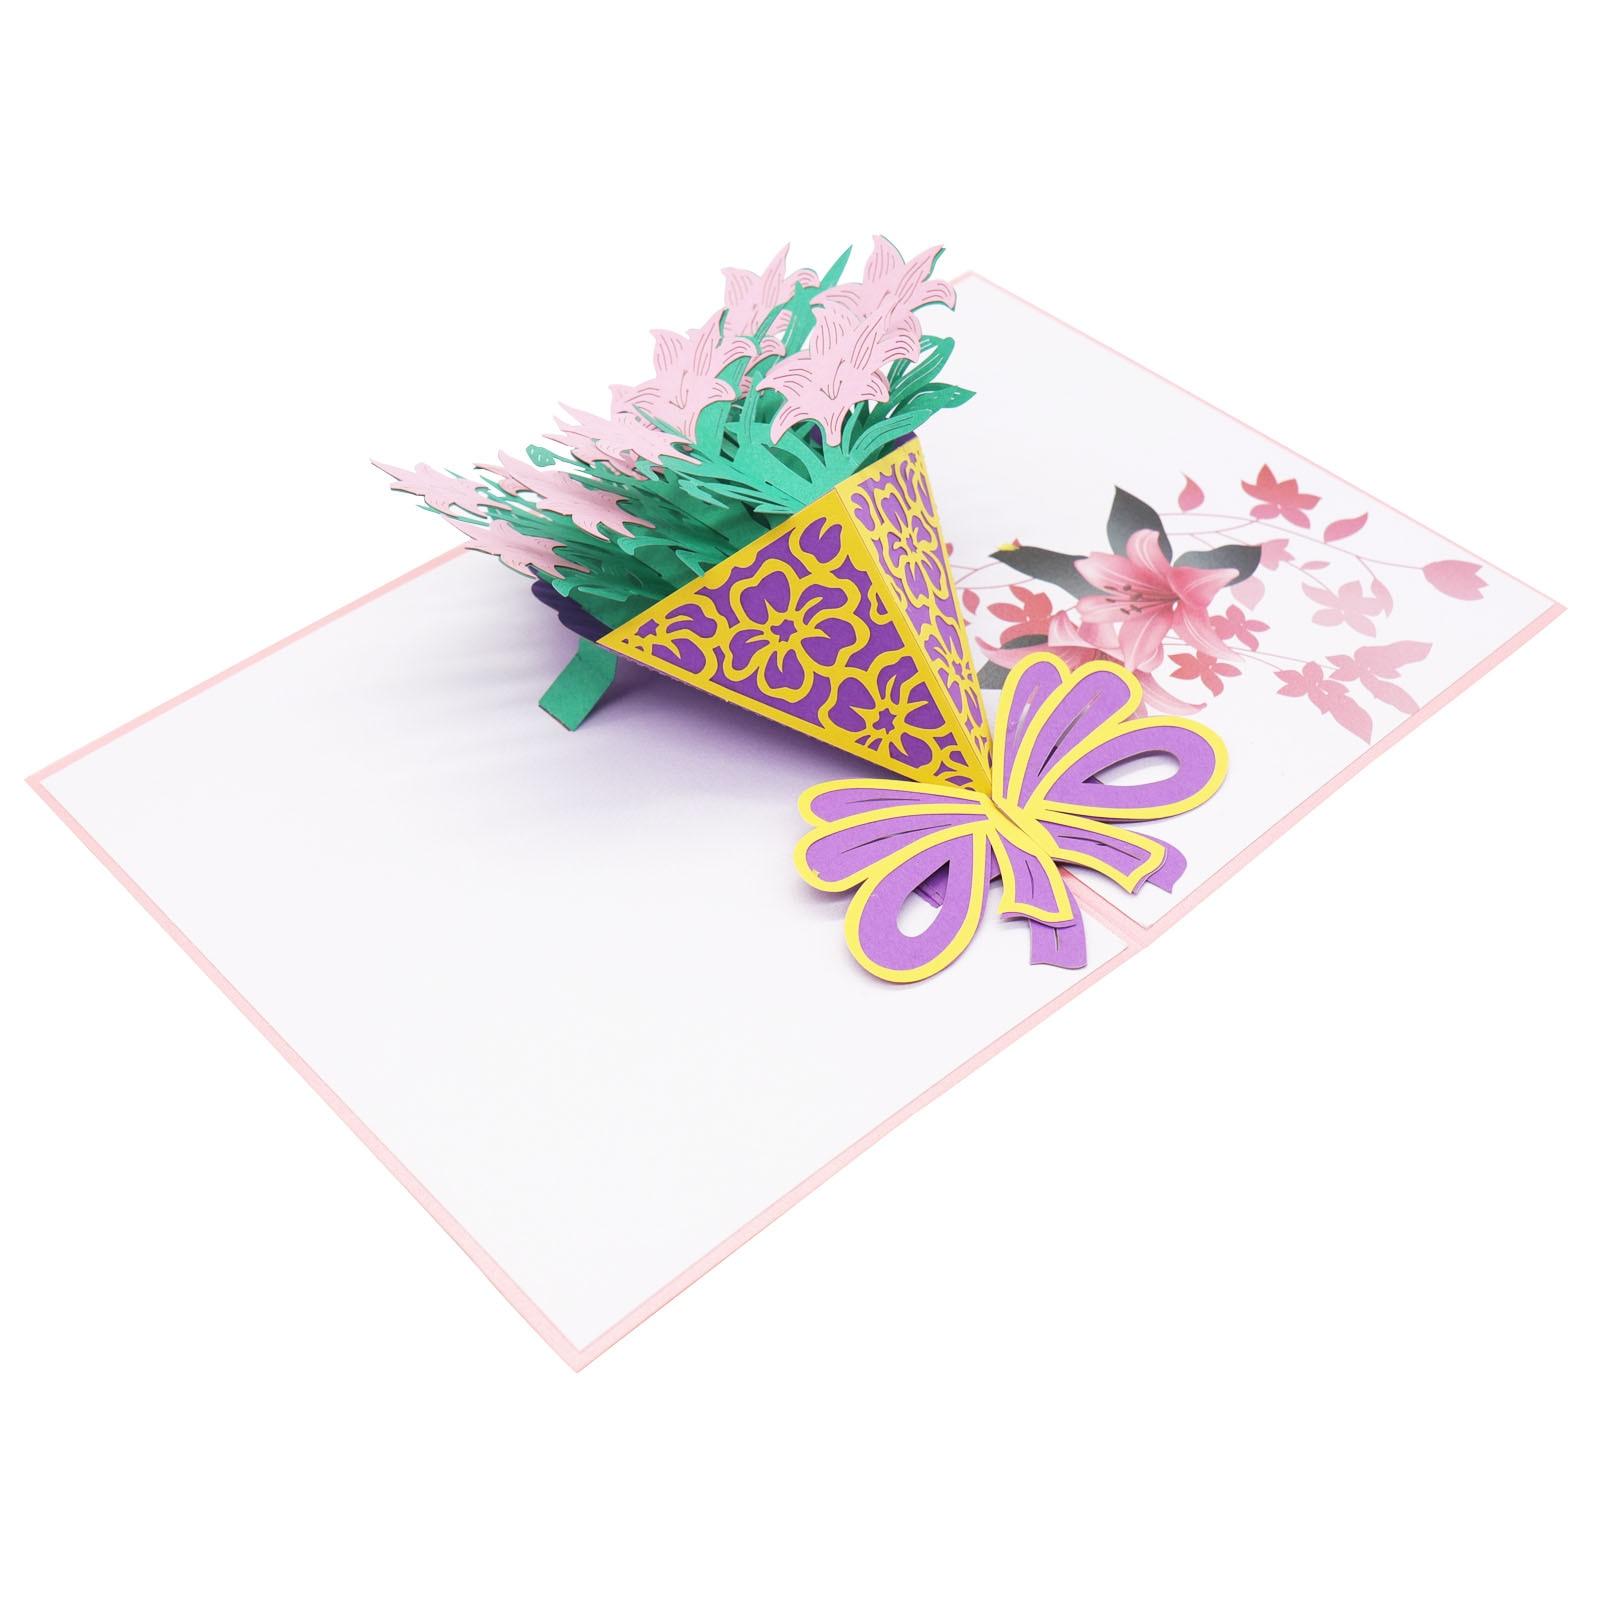 Hot Sale New 3d Pop Up Greeting Card Love Romantic Birthday Wedding